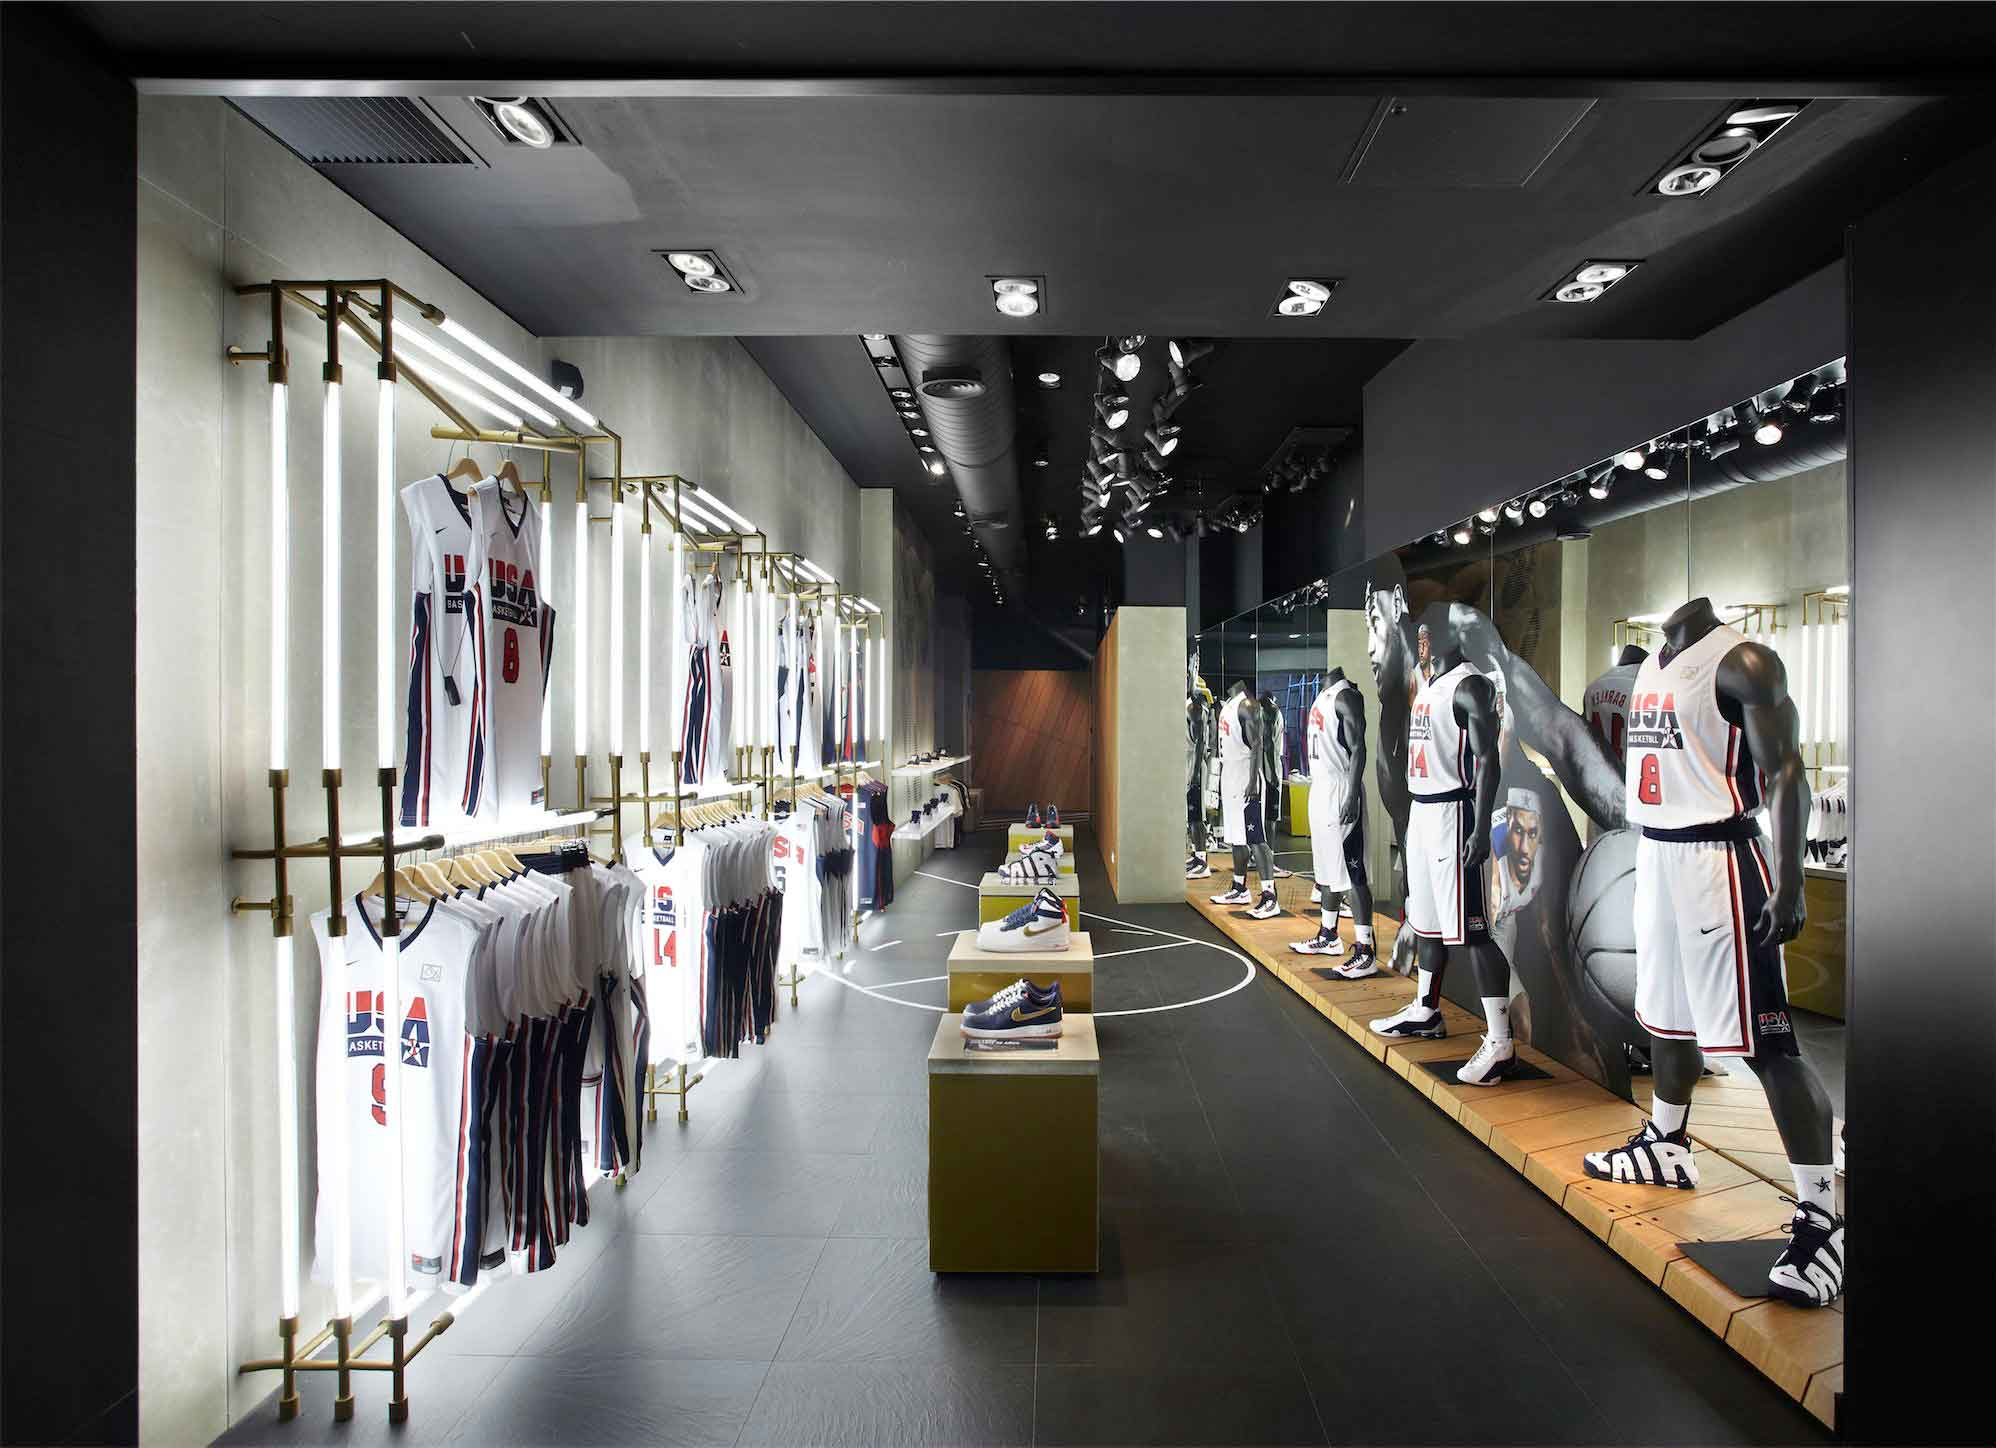 La tienda Nike revive los JJOO de Barcelona